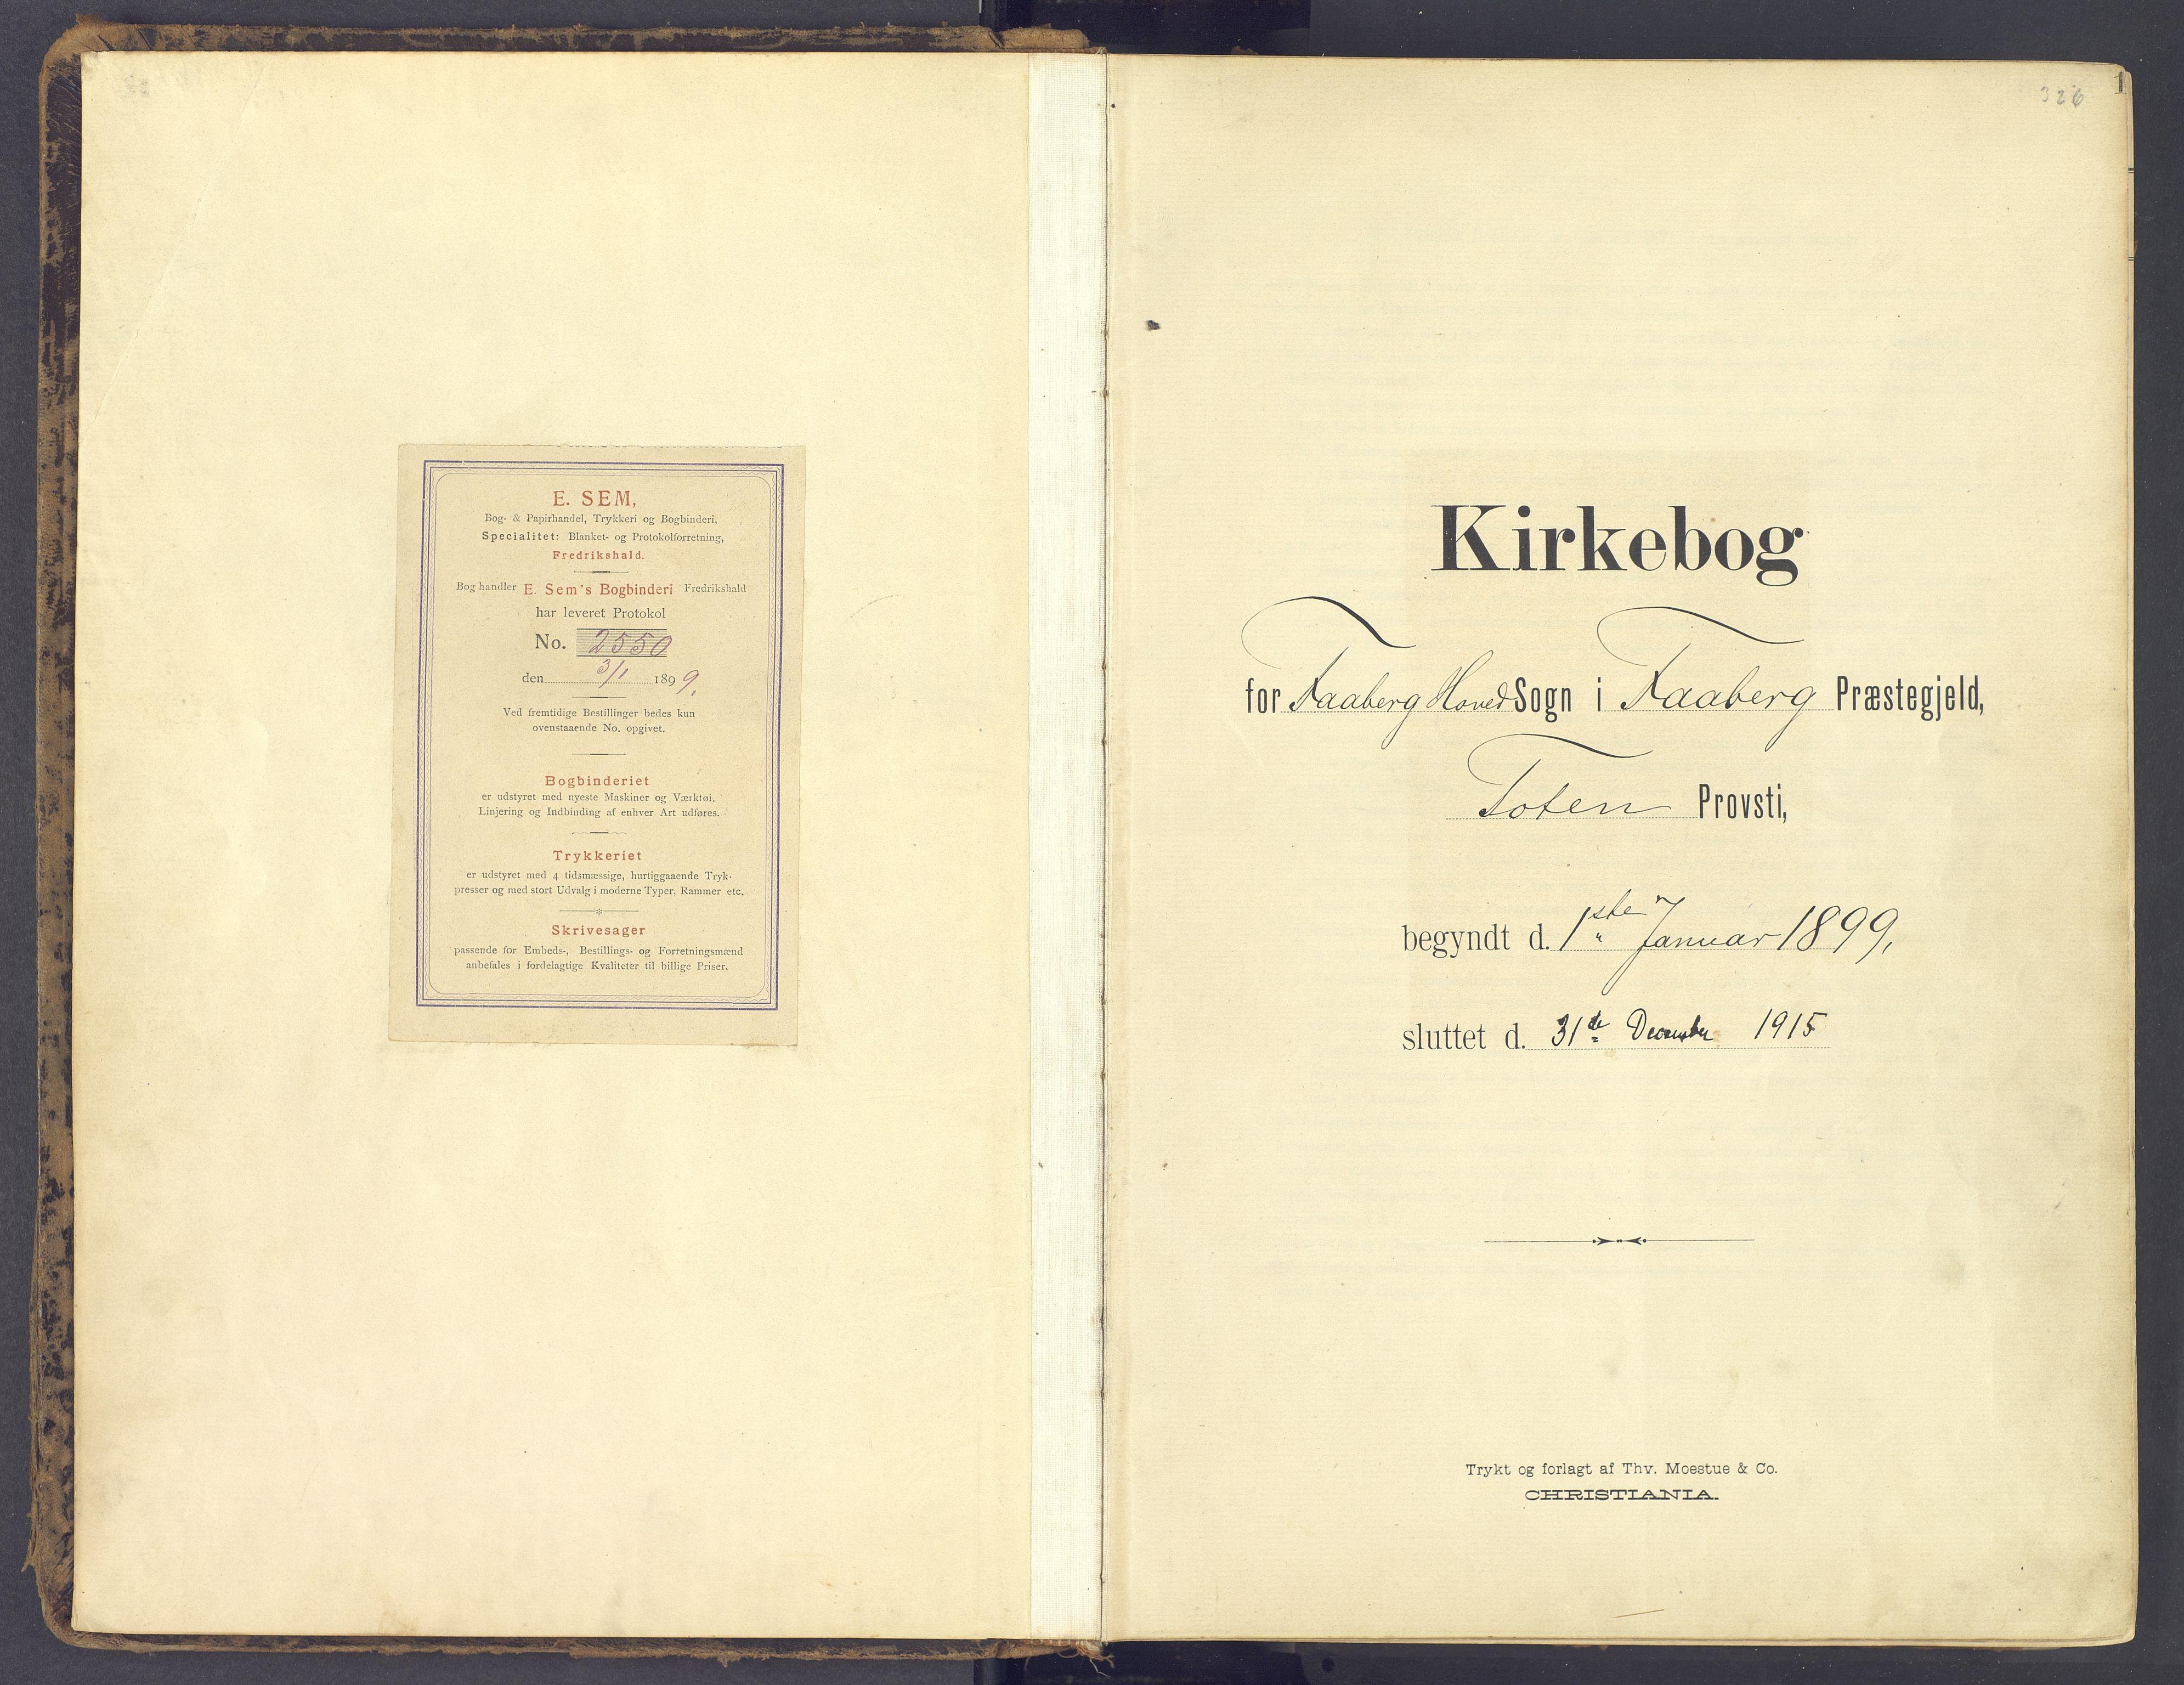 SAH, Fåberg prestekontor, Ministerialbok nr. 12, 1899-1915, s. 1